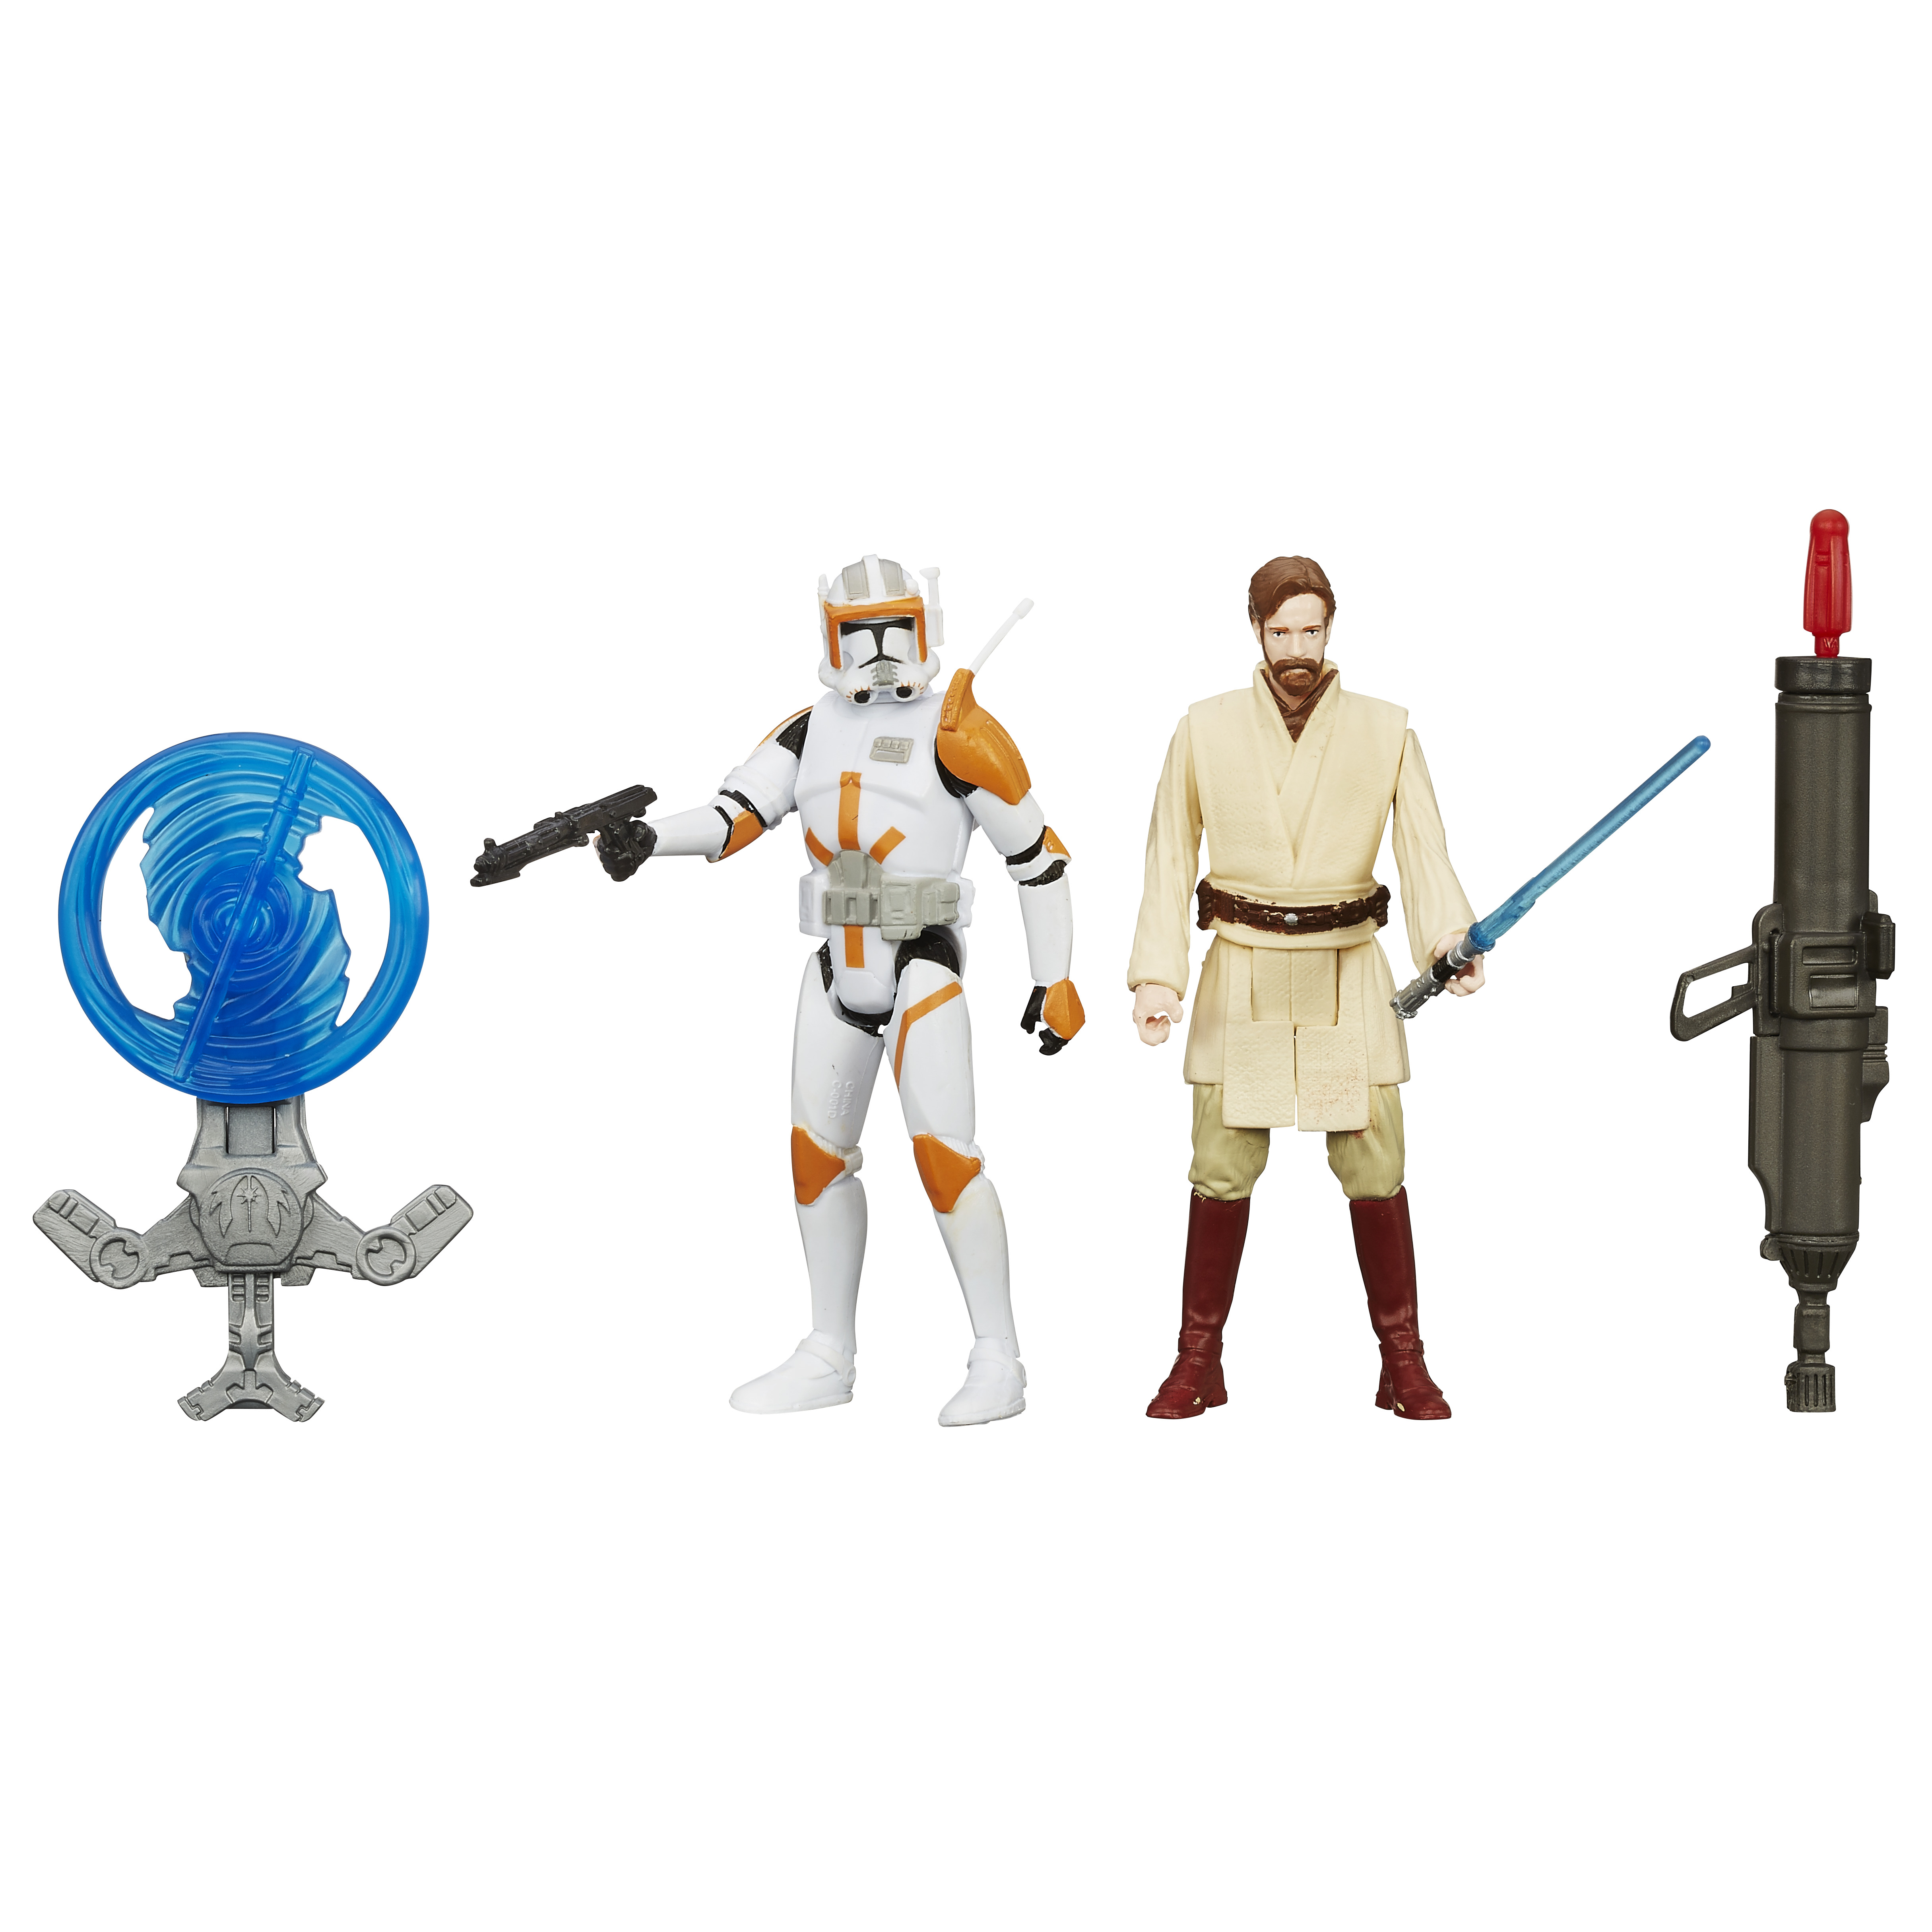 <b>Star Wars <i>The Force Awakens</i></b>; Stormtrooper Commander and Obi Wan Kenobi